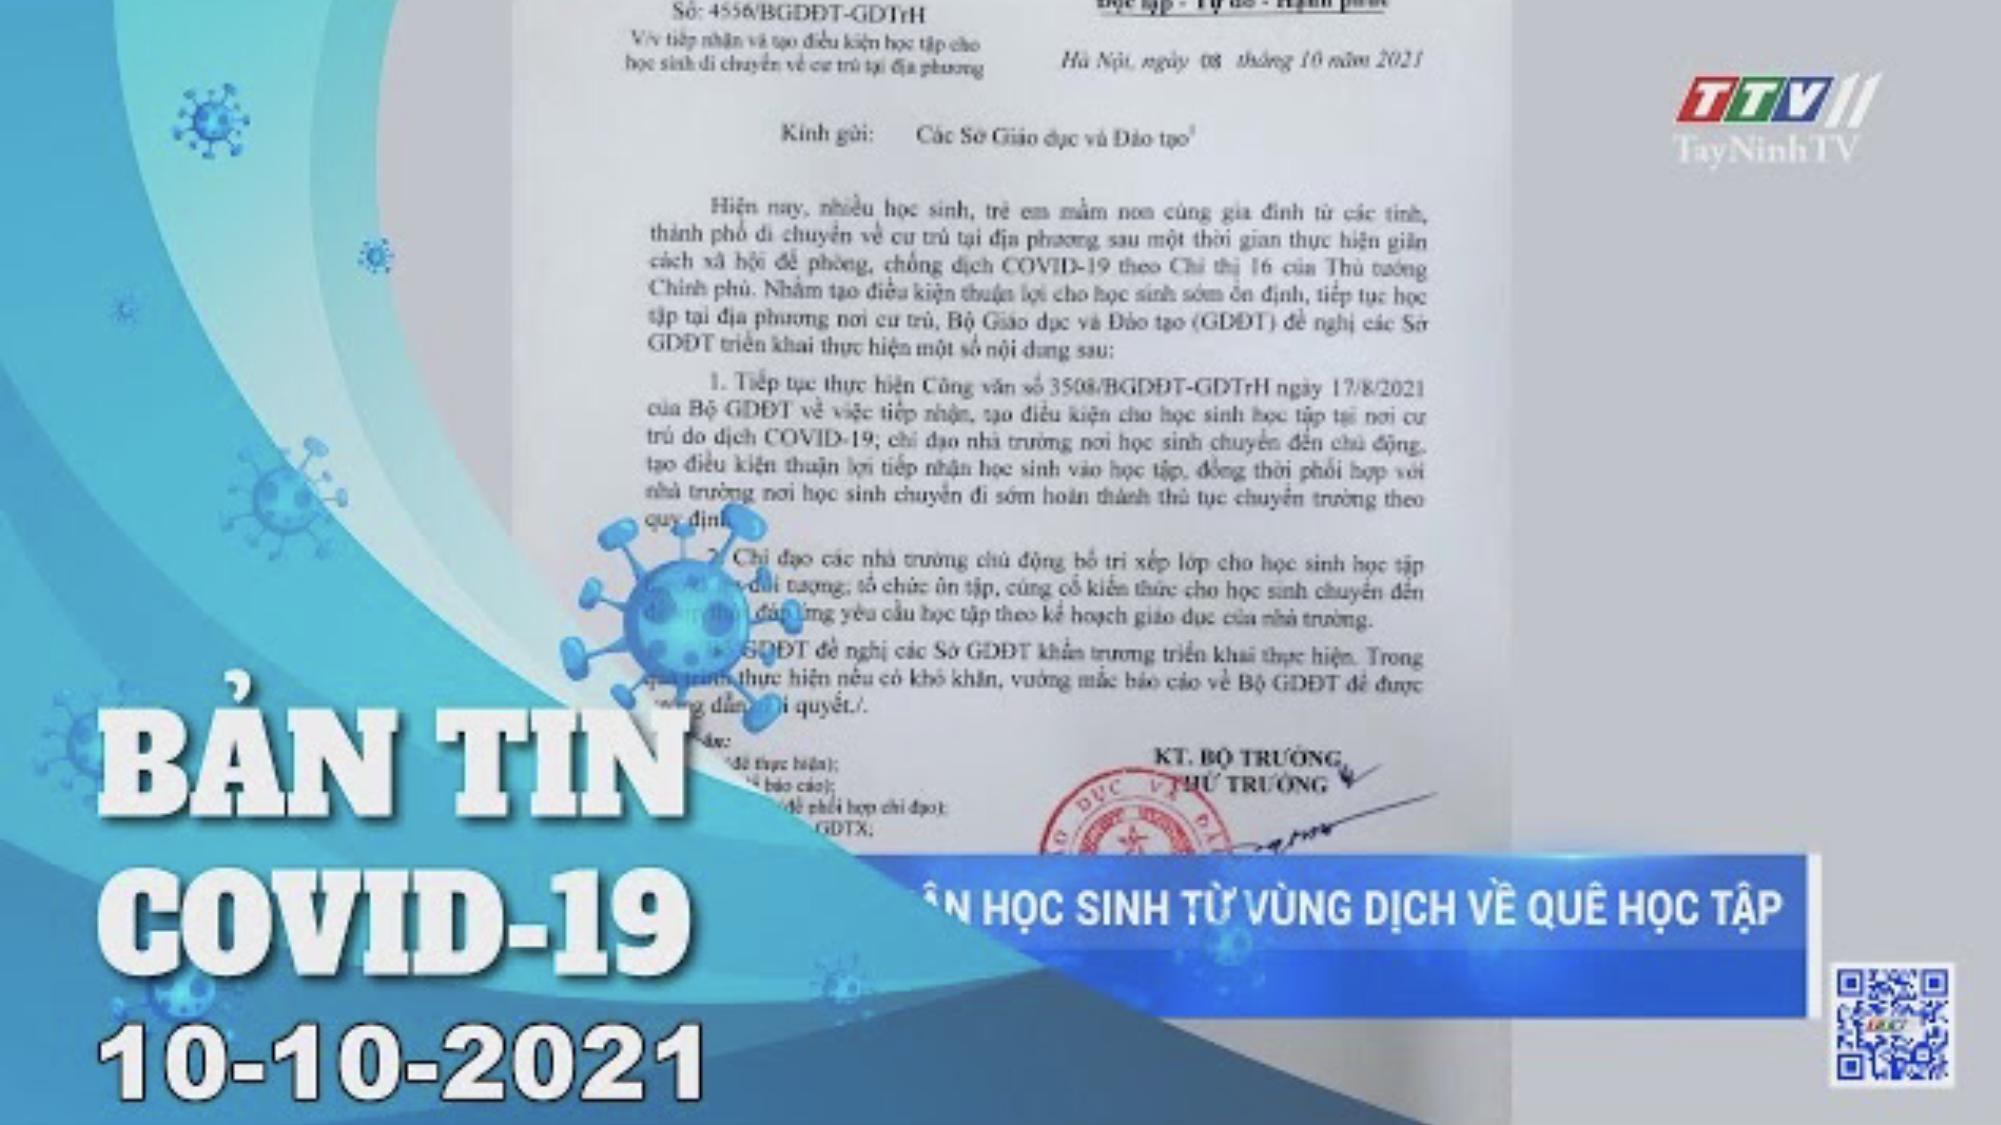 BẢN TIN COVID-19 10/10/2021 | Tin tức hôm nay | TayNinhTV